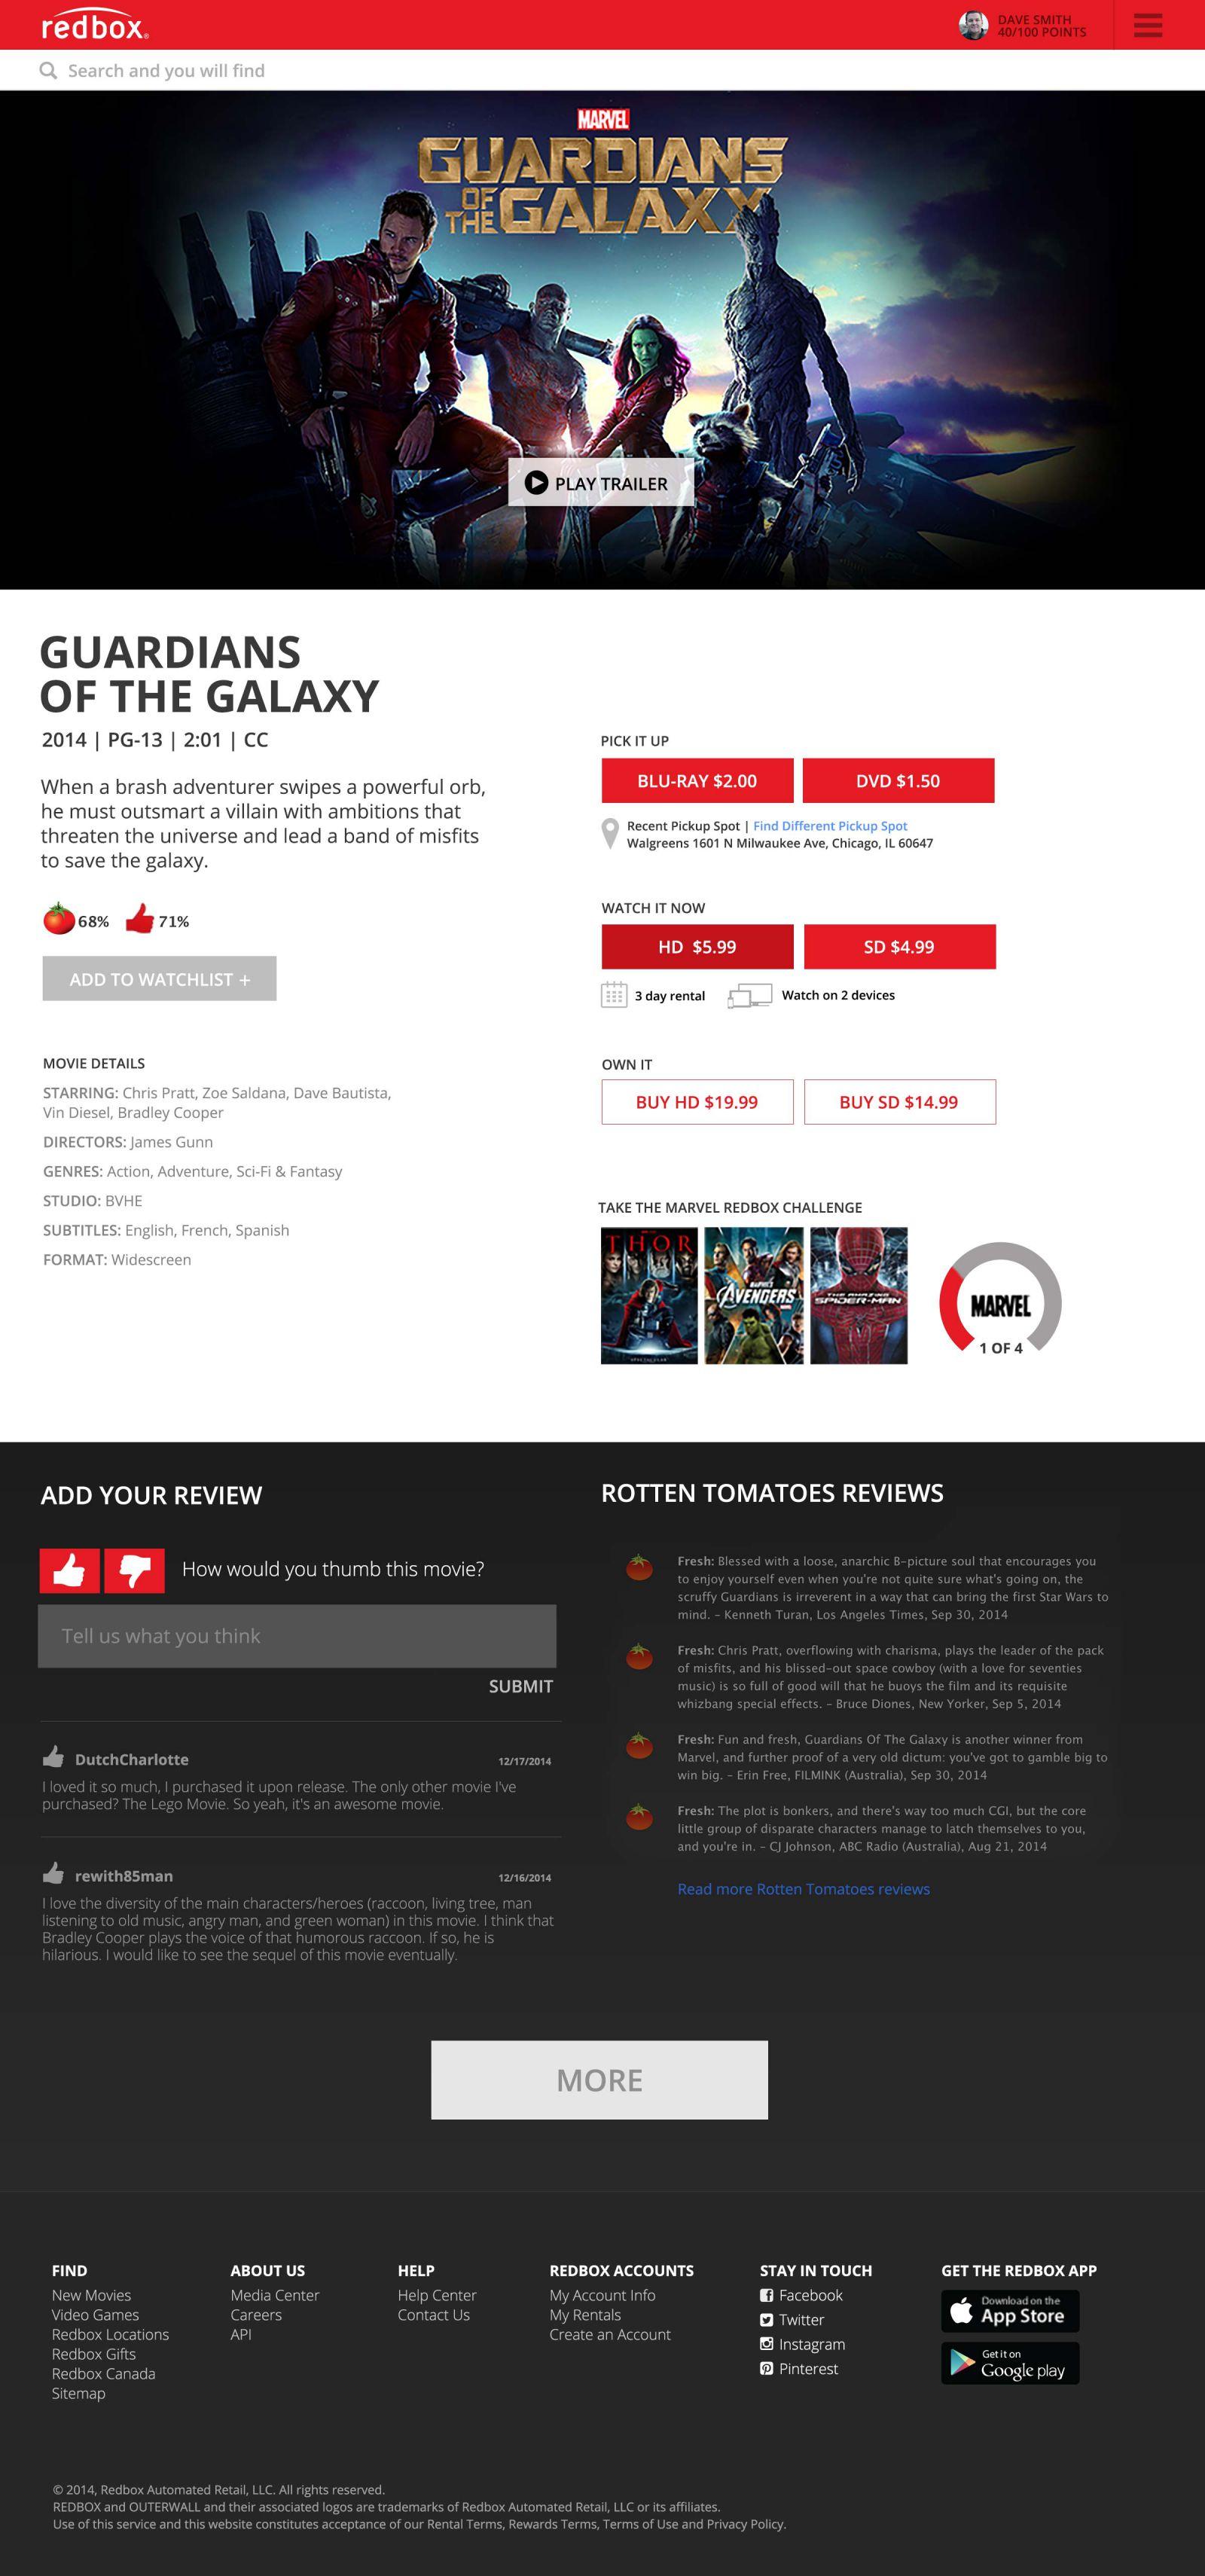 Movie detail page